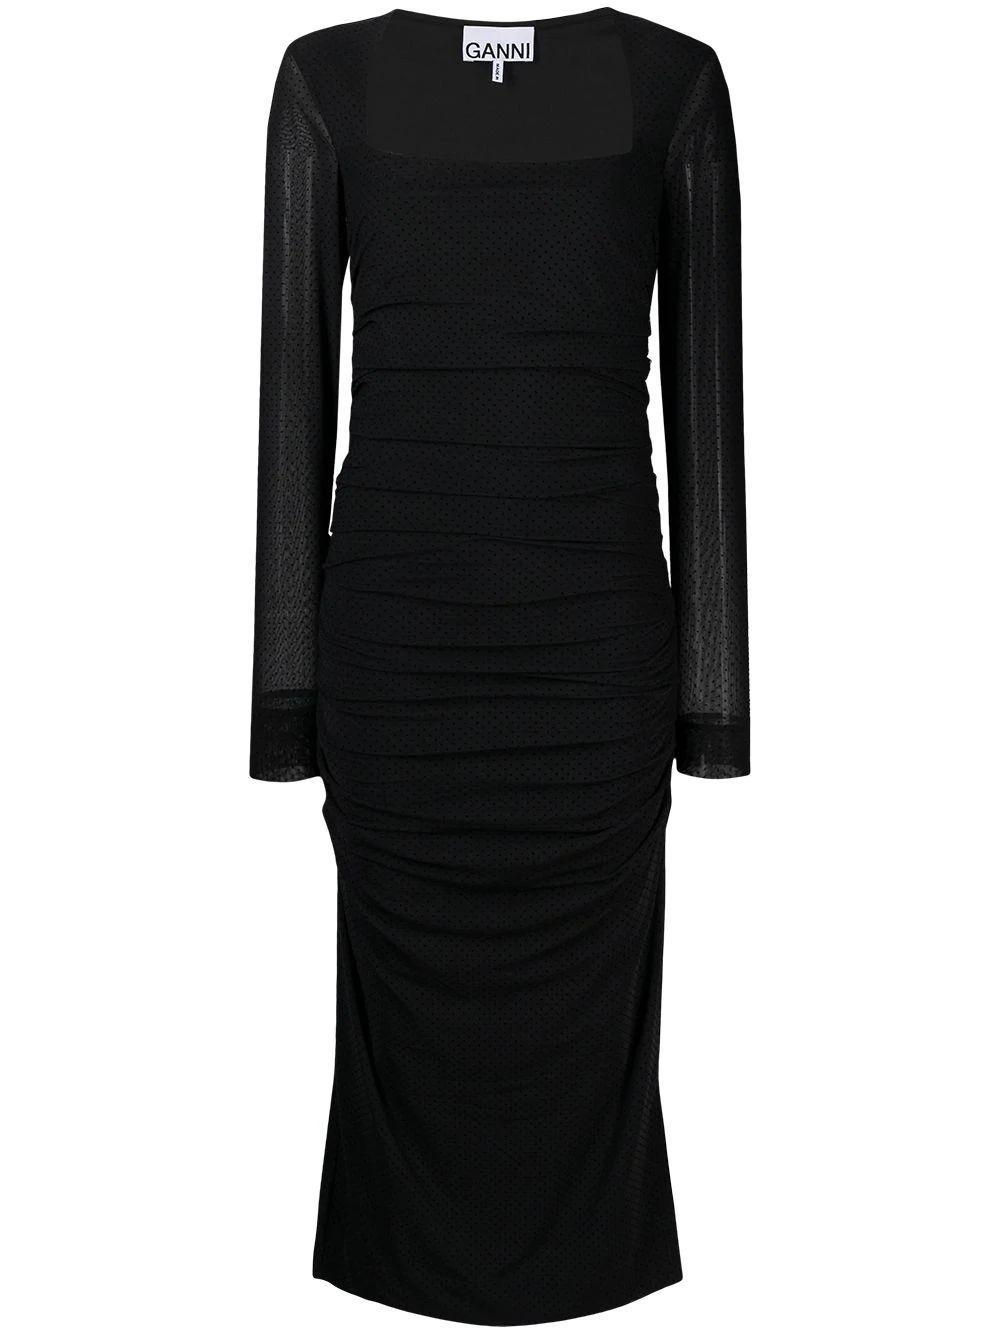 Dotted Mesh Midi Dress